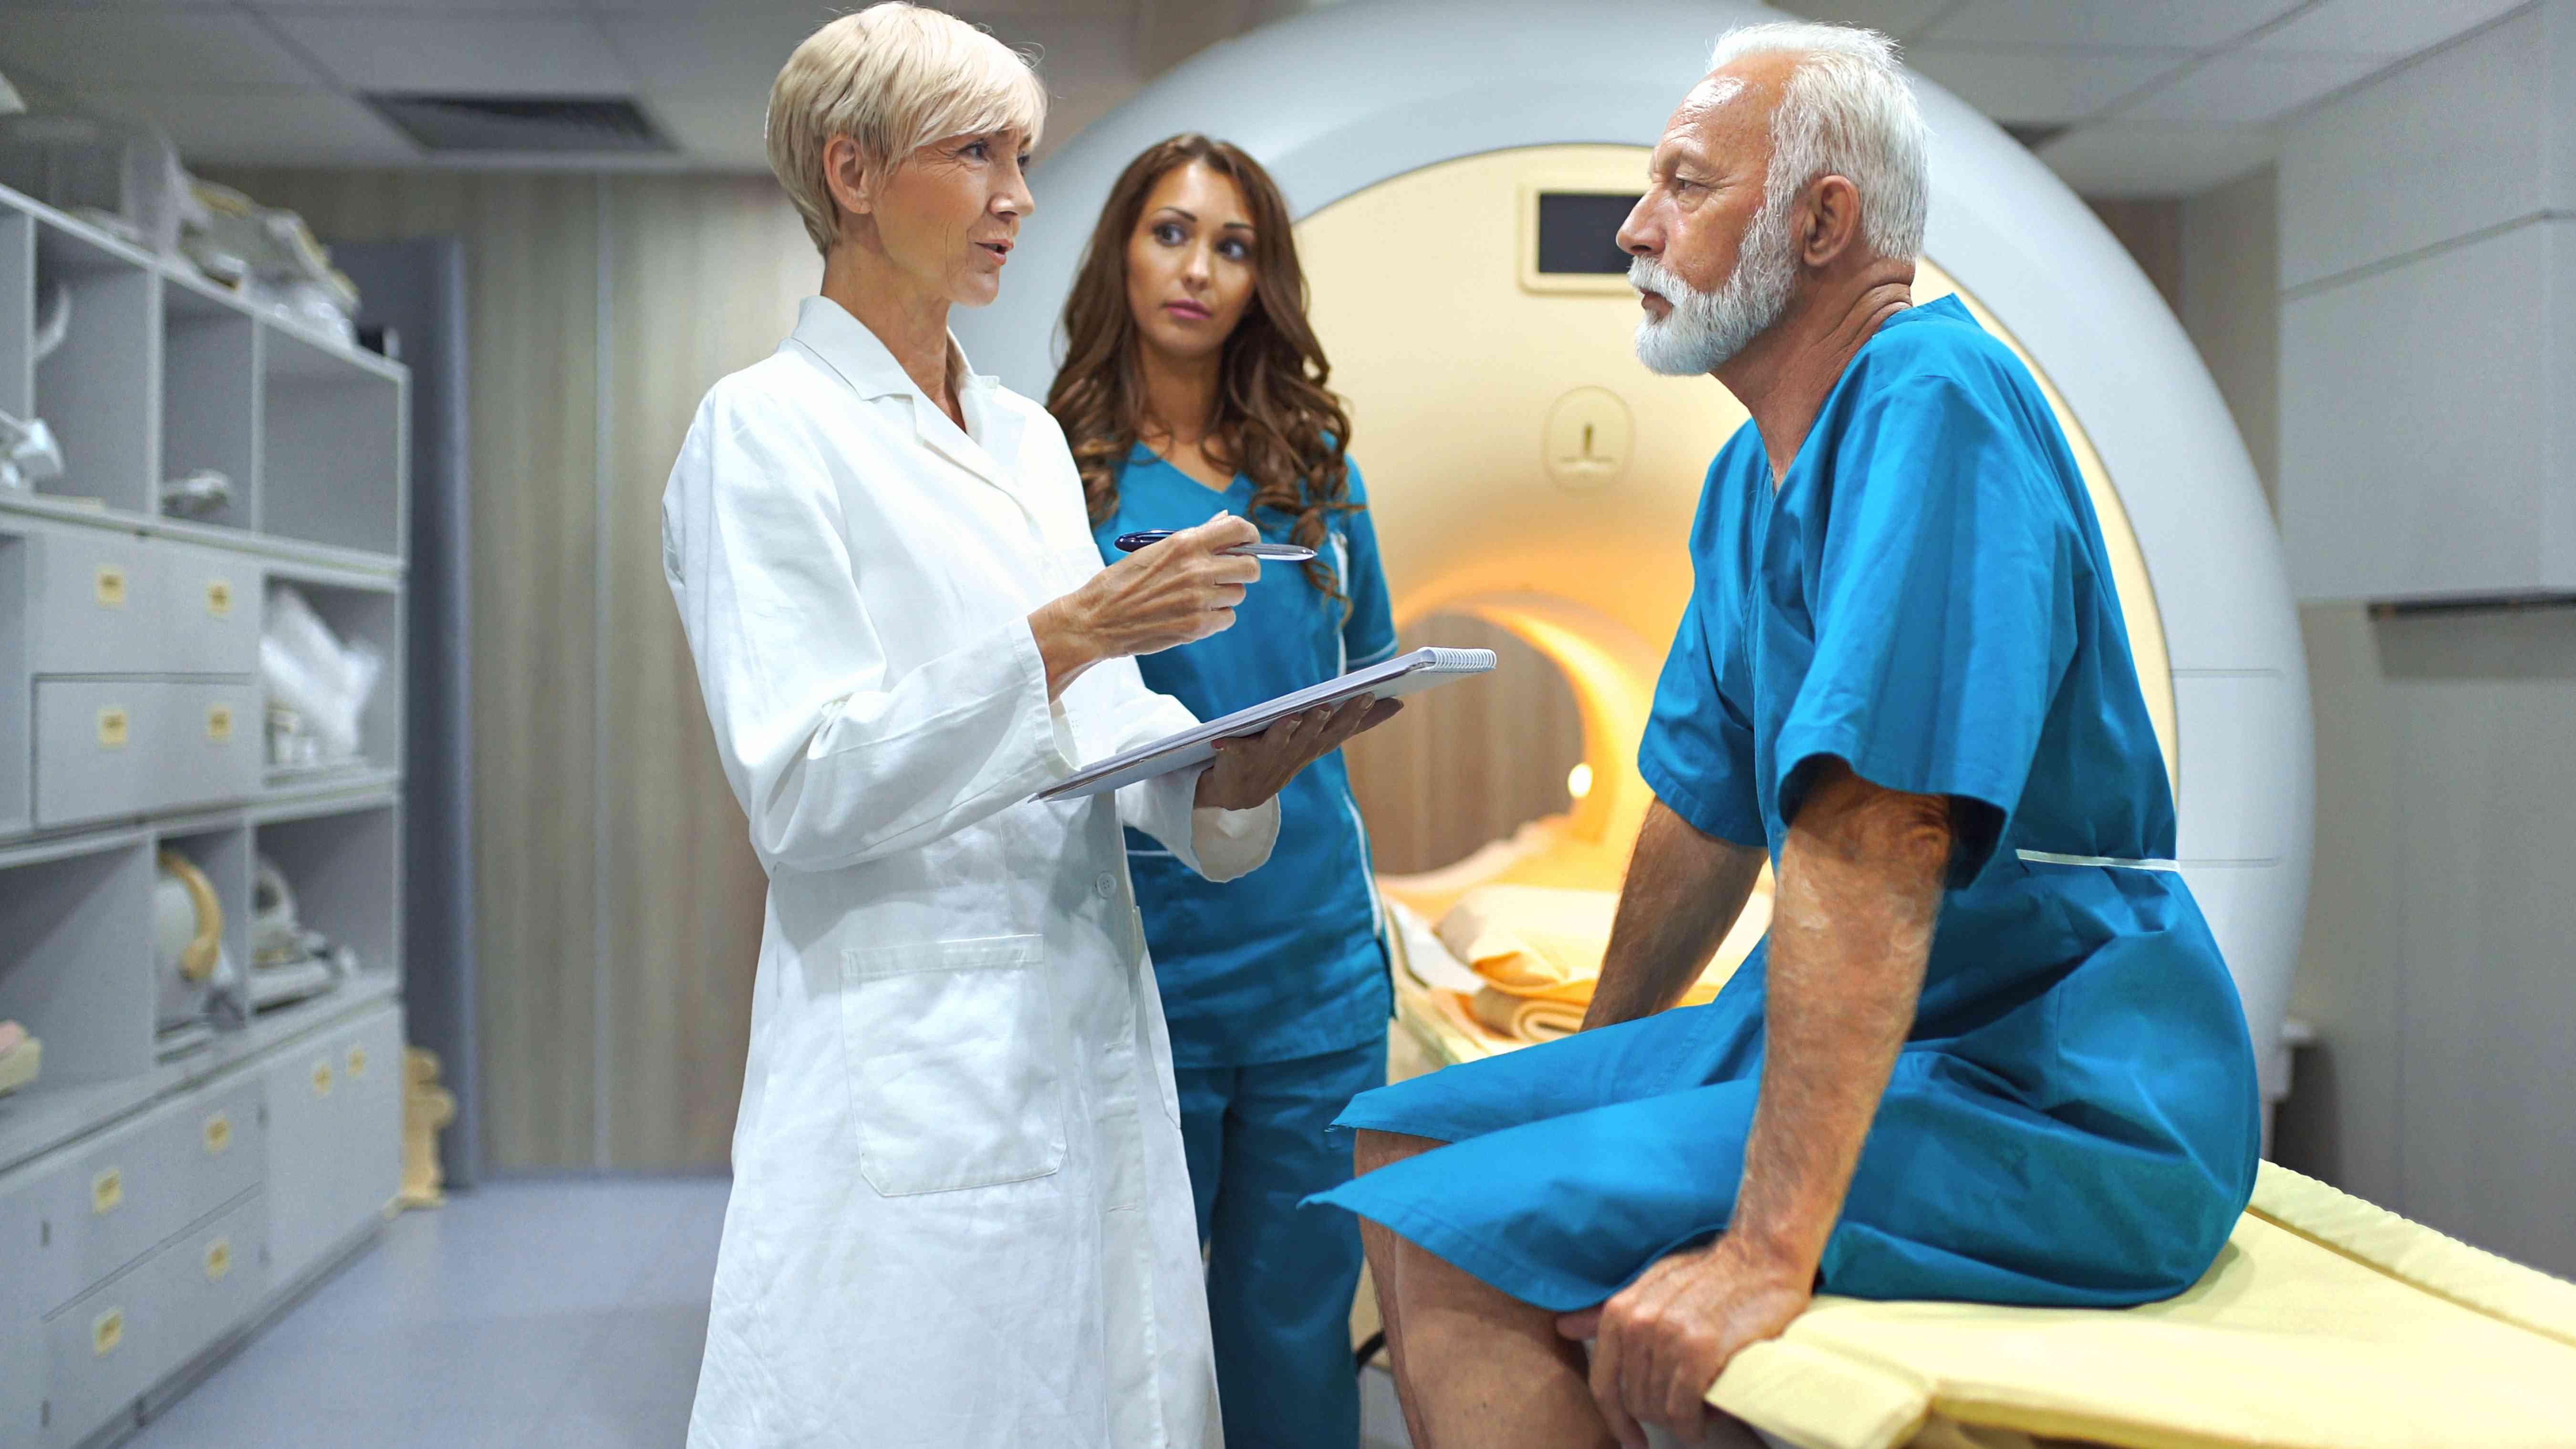 MRI scanning procedure.